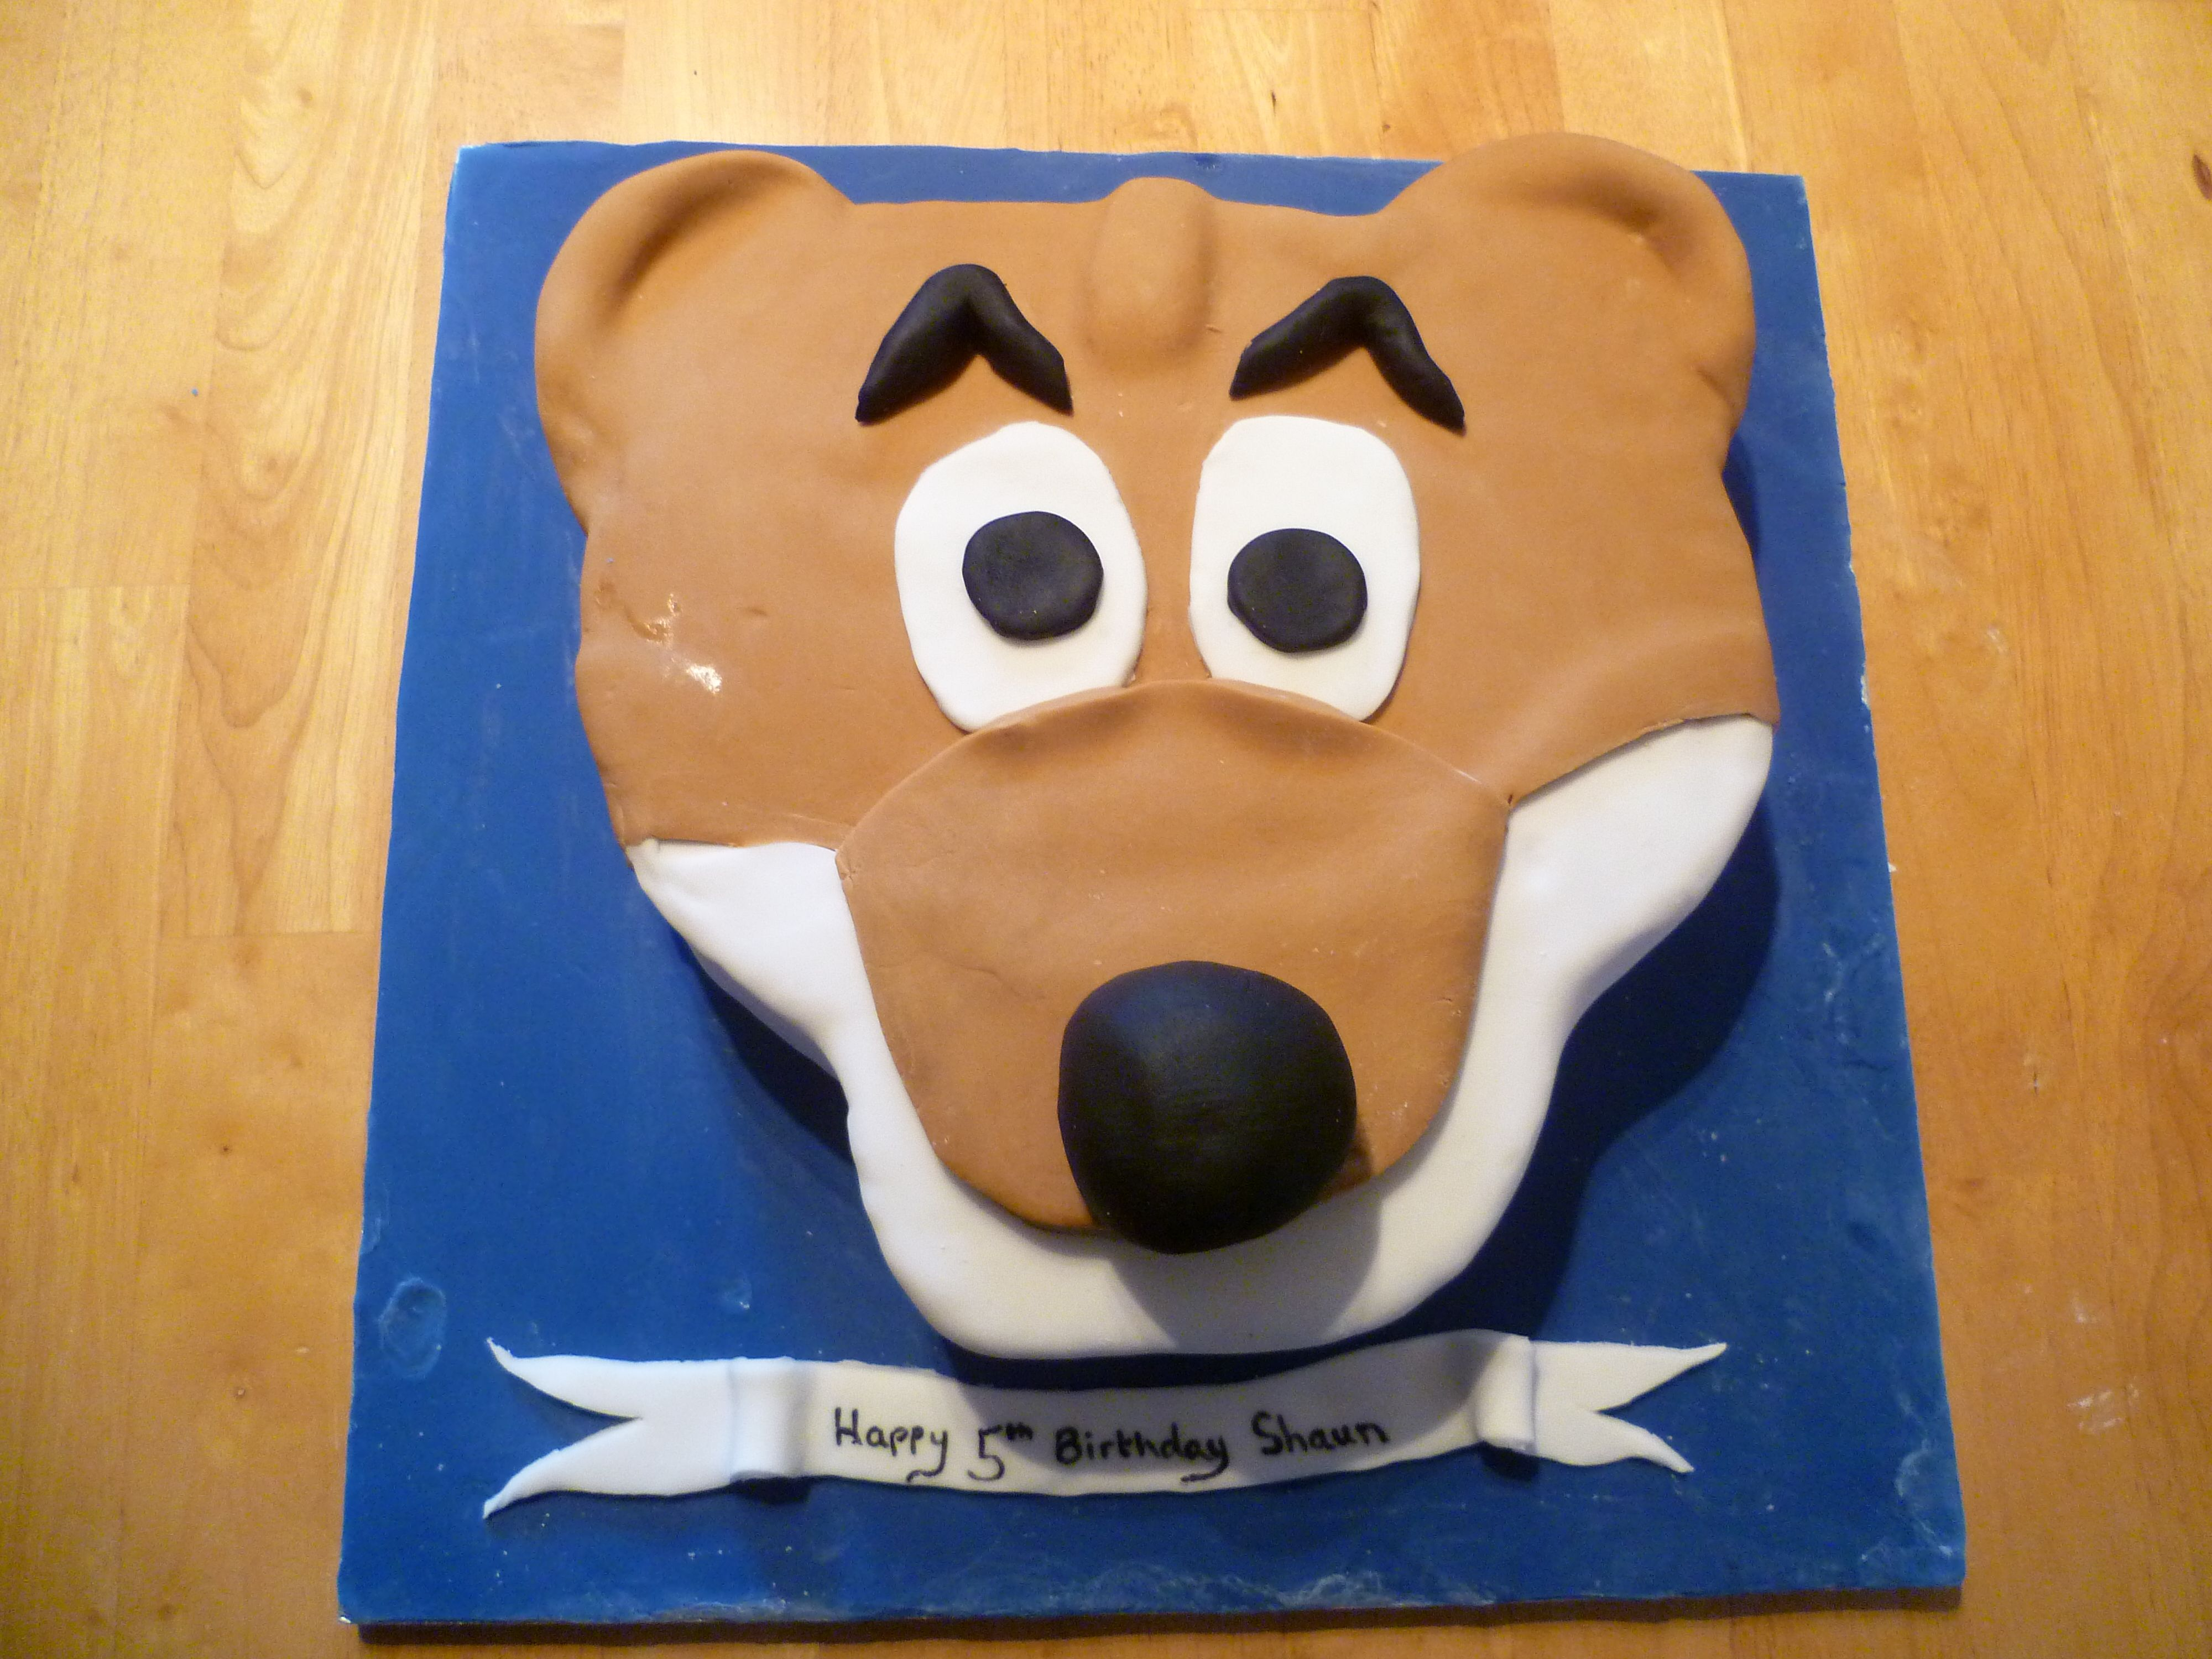 Leicester City Football Club Mascot Filbert Fox Leicester City